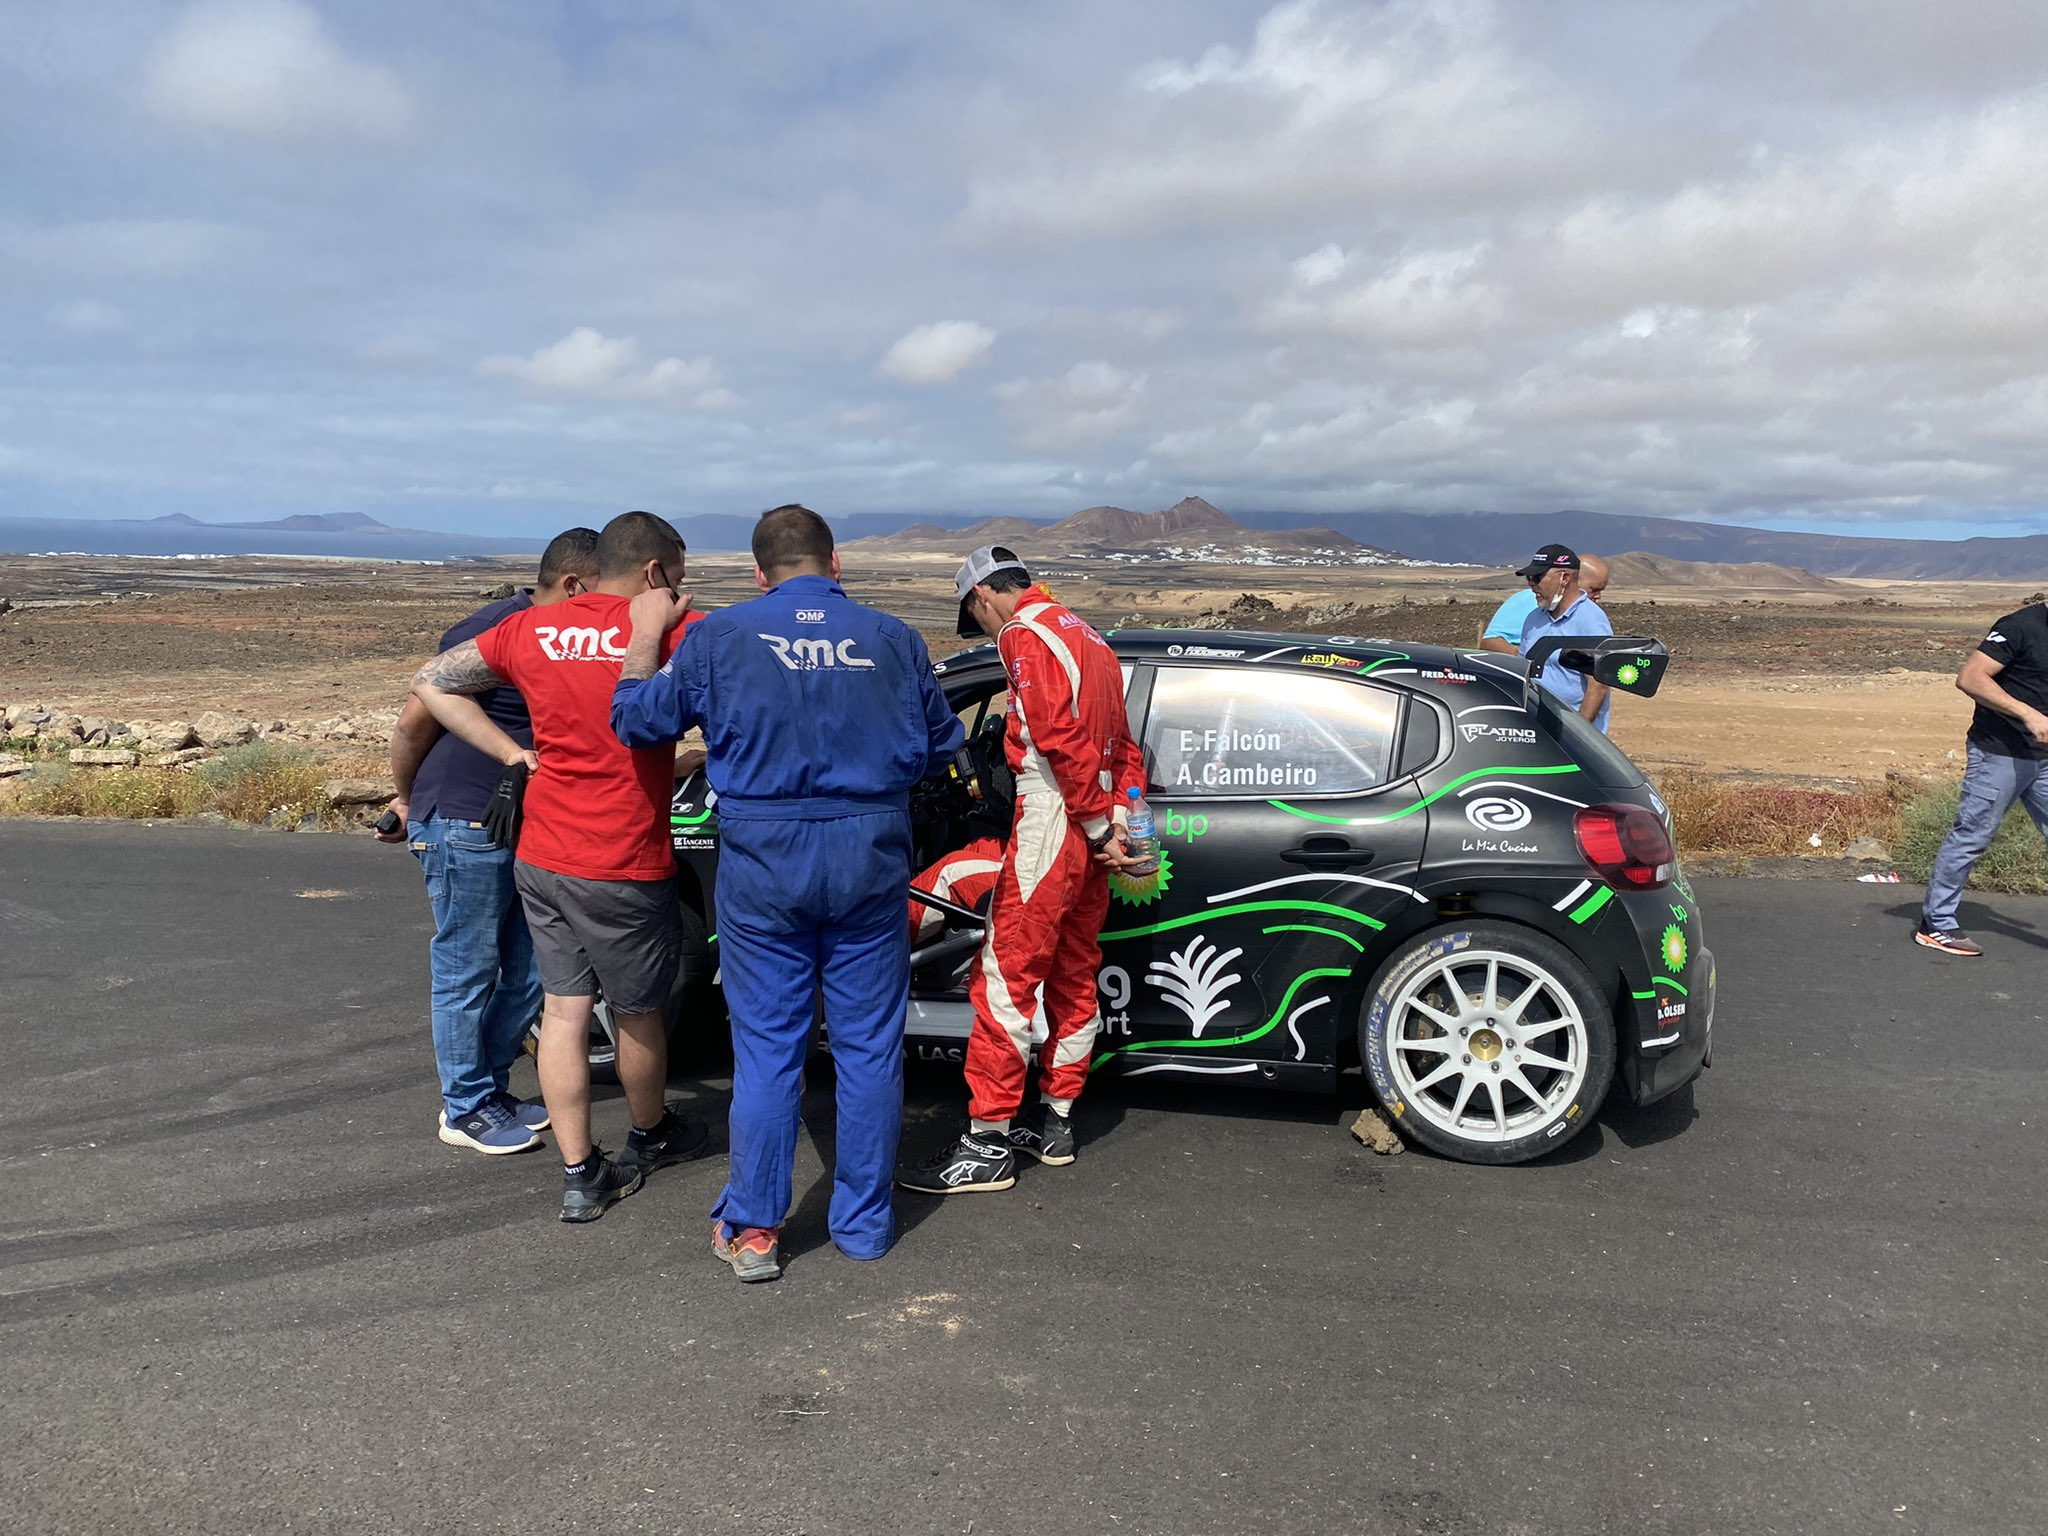 SCER: 30º Rallye Villa de Adeje BP Tenerife - Trofeo Cicar [13-15 Mayo] E09ys3eXsAI8Zhj?format=jpg&name=large